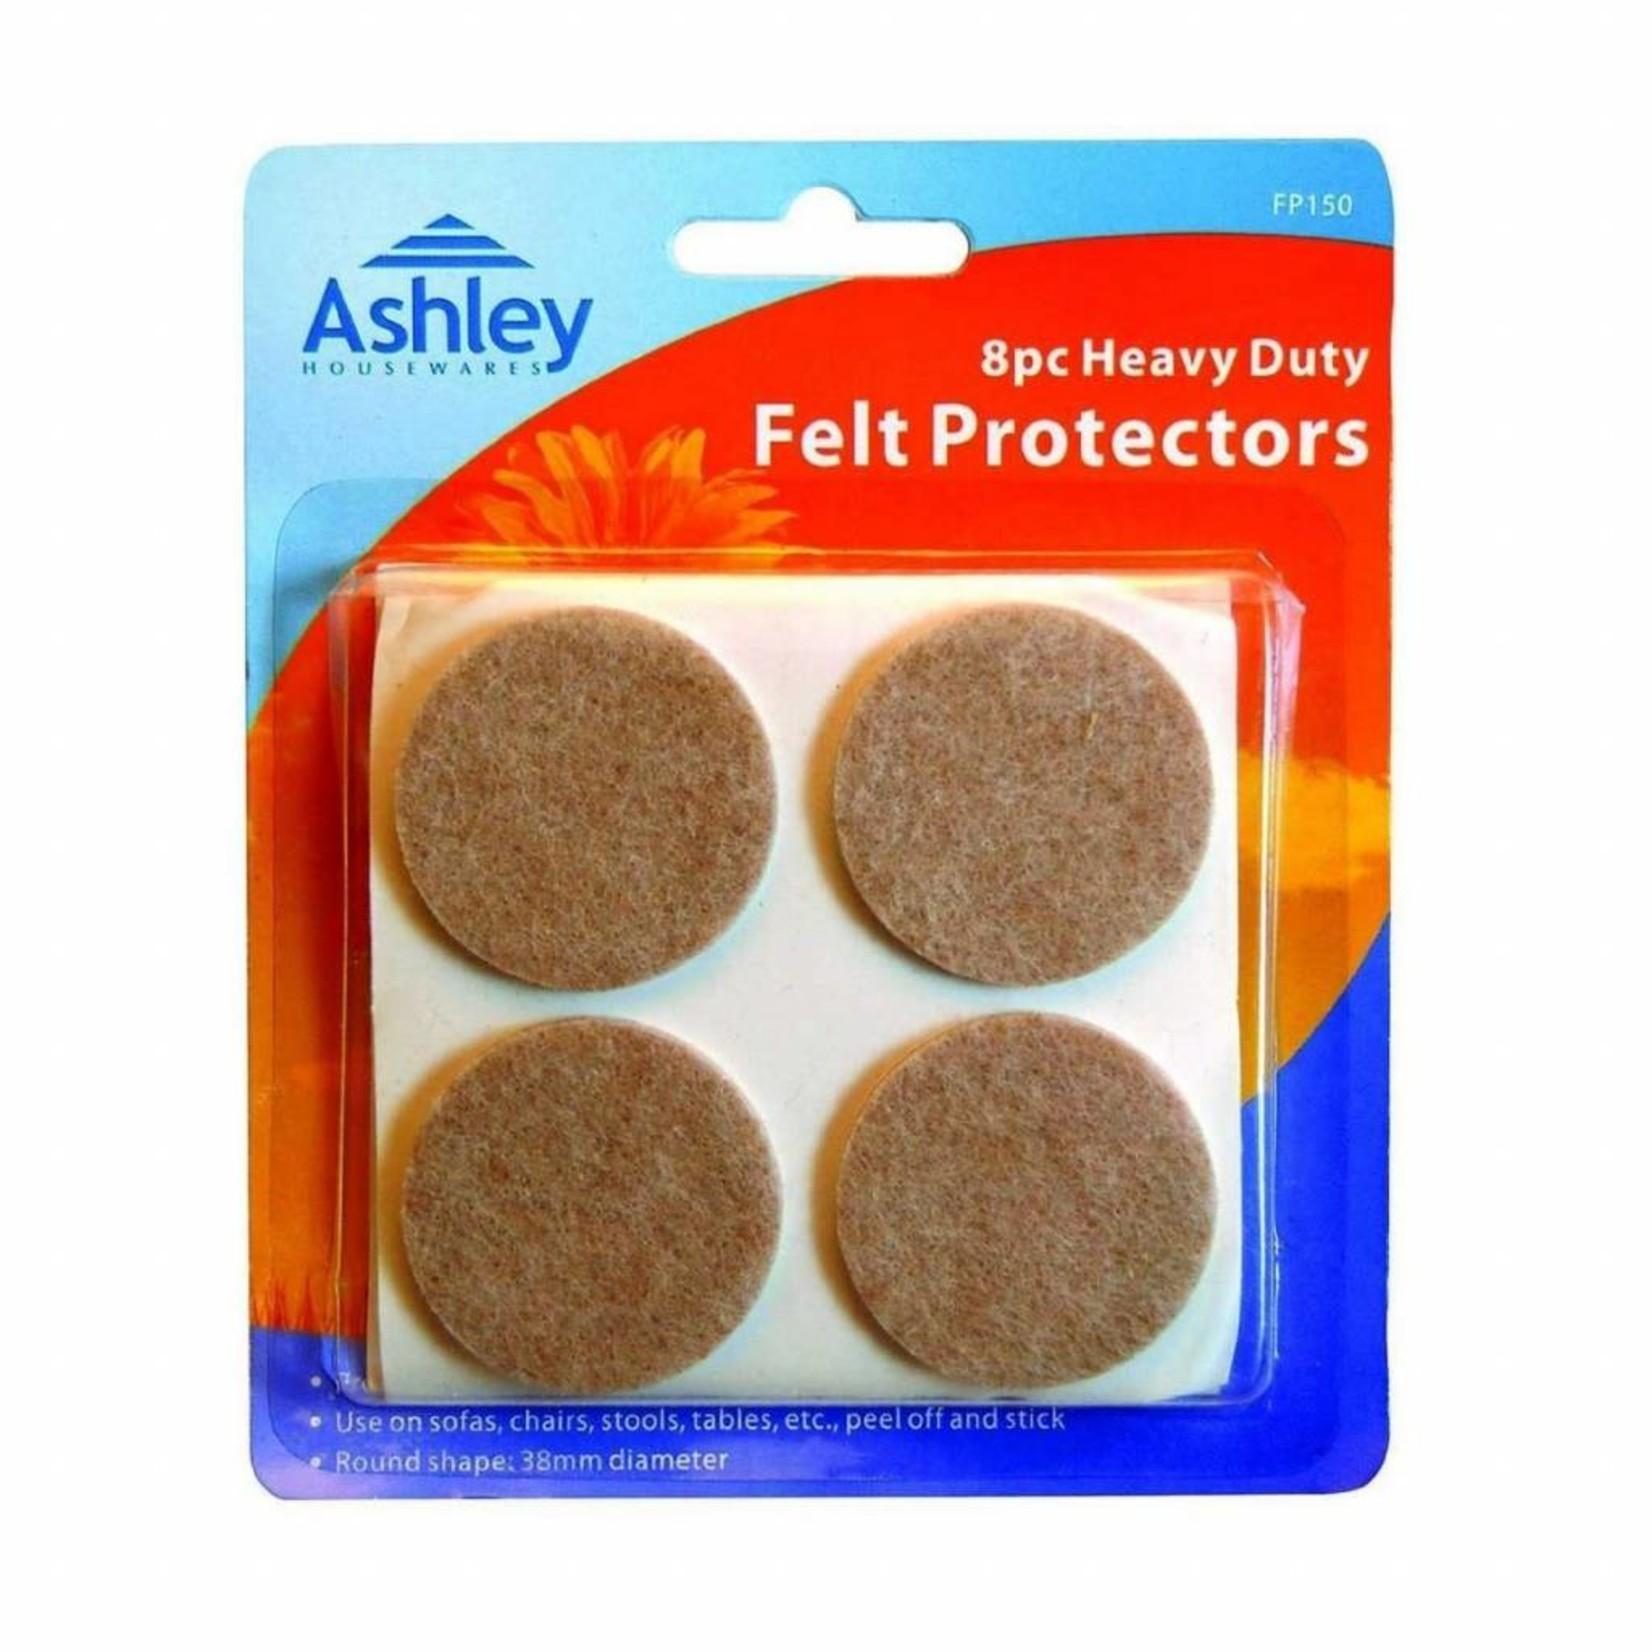 ASHLEY HEAVY DUTY FELT PROTECTORS 8 PACK